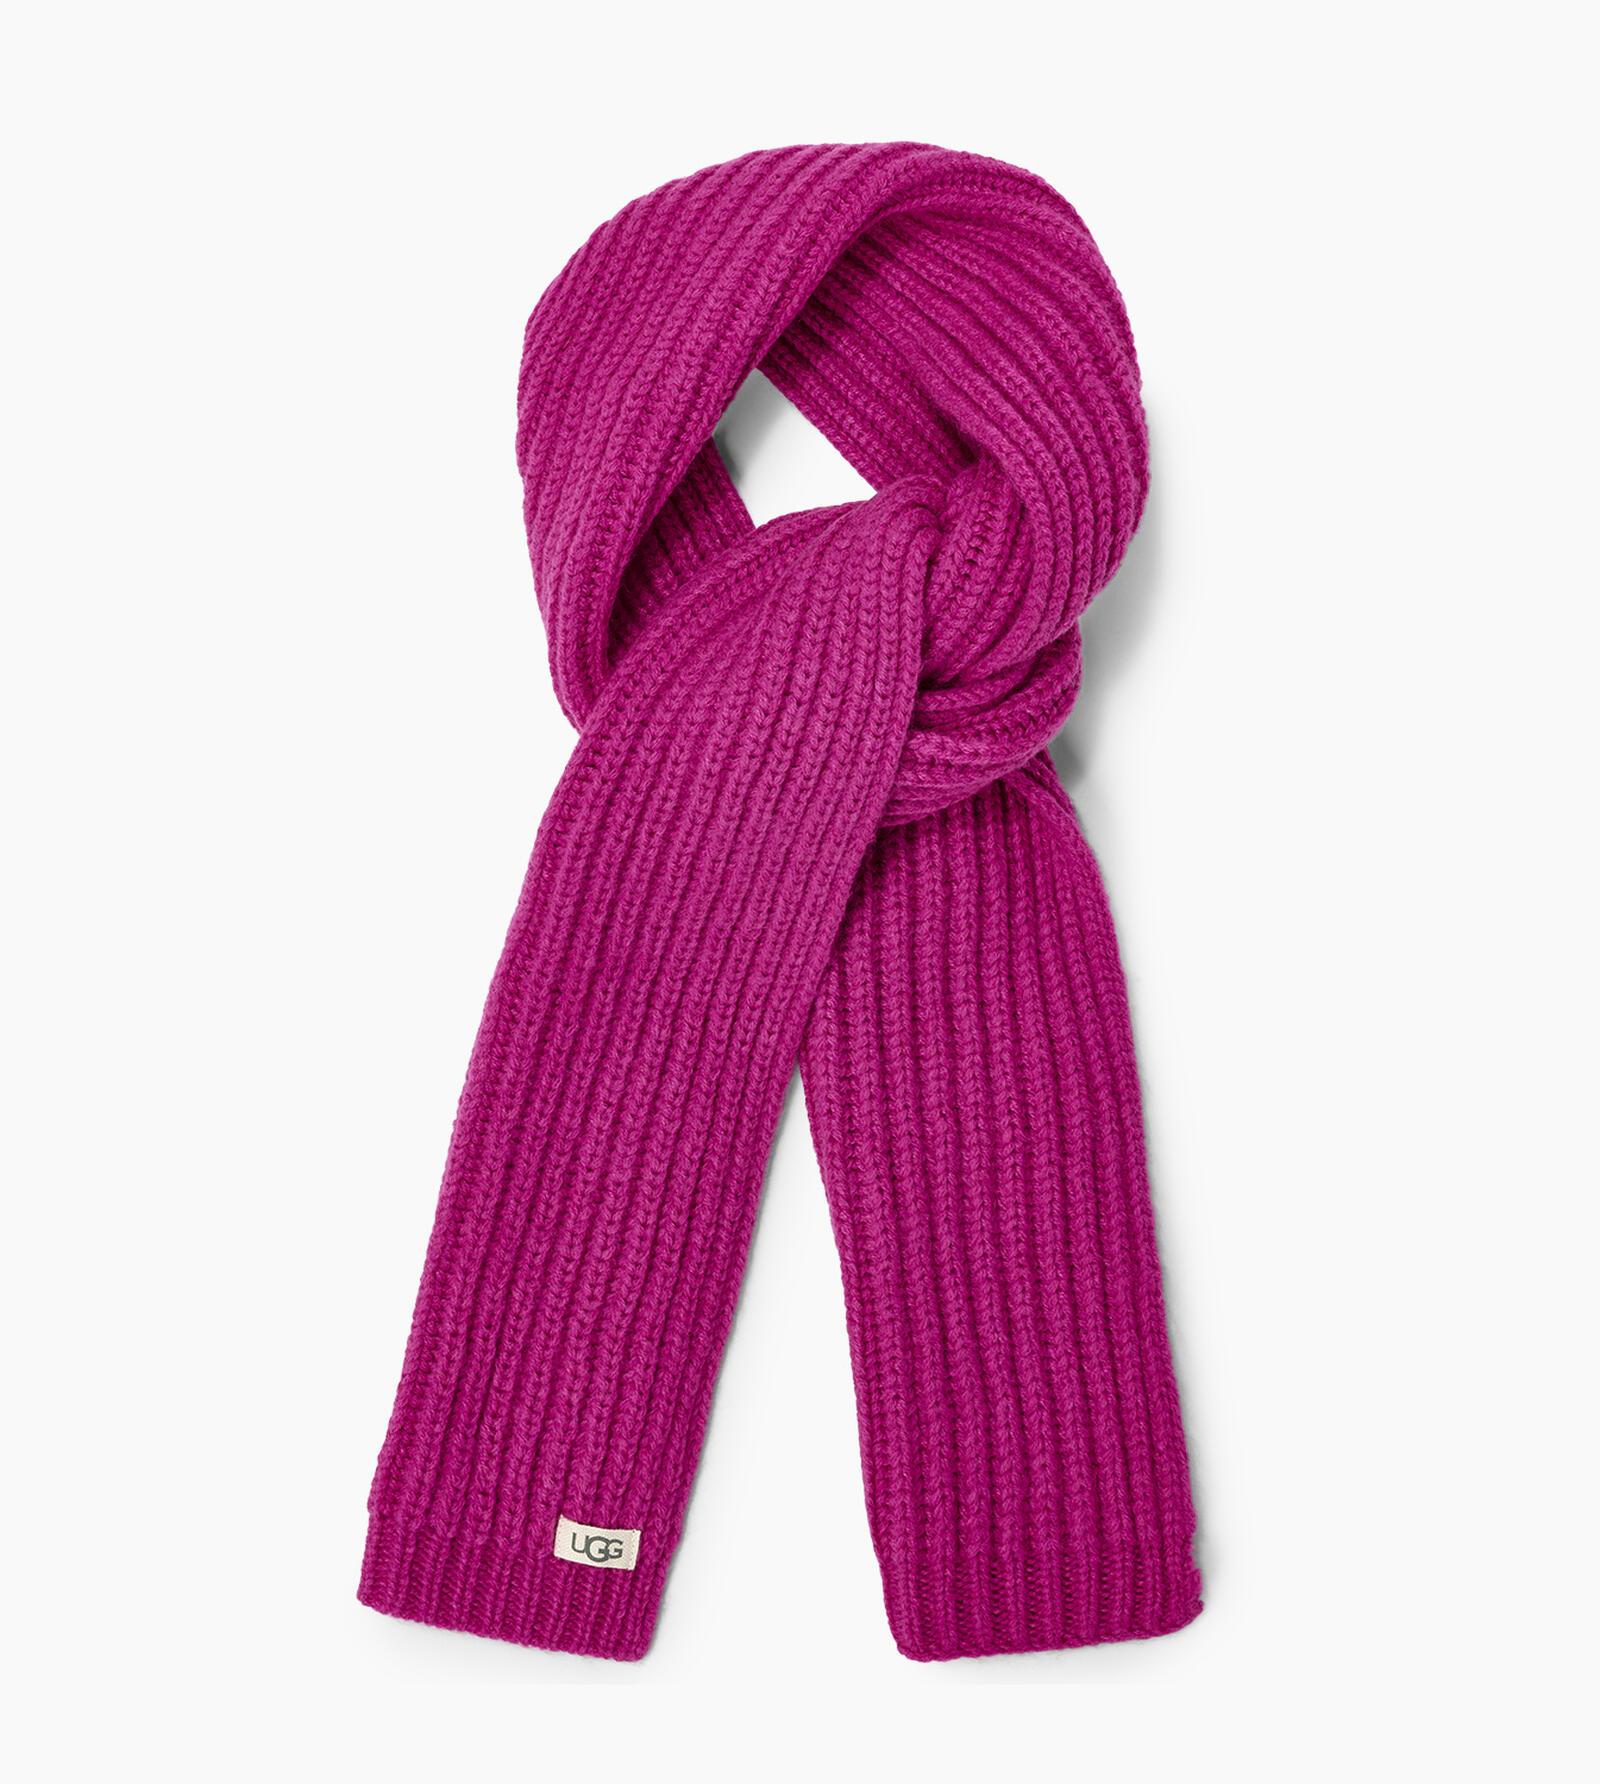 Rib Knit Hat and Scarf Set